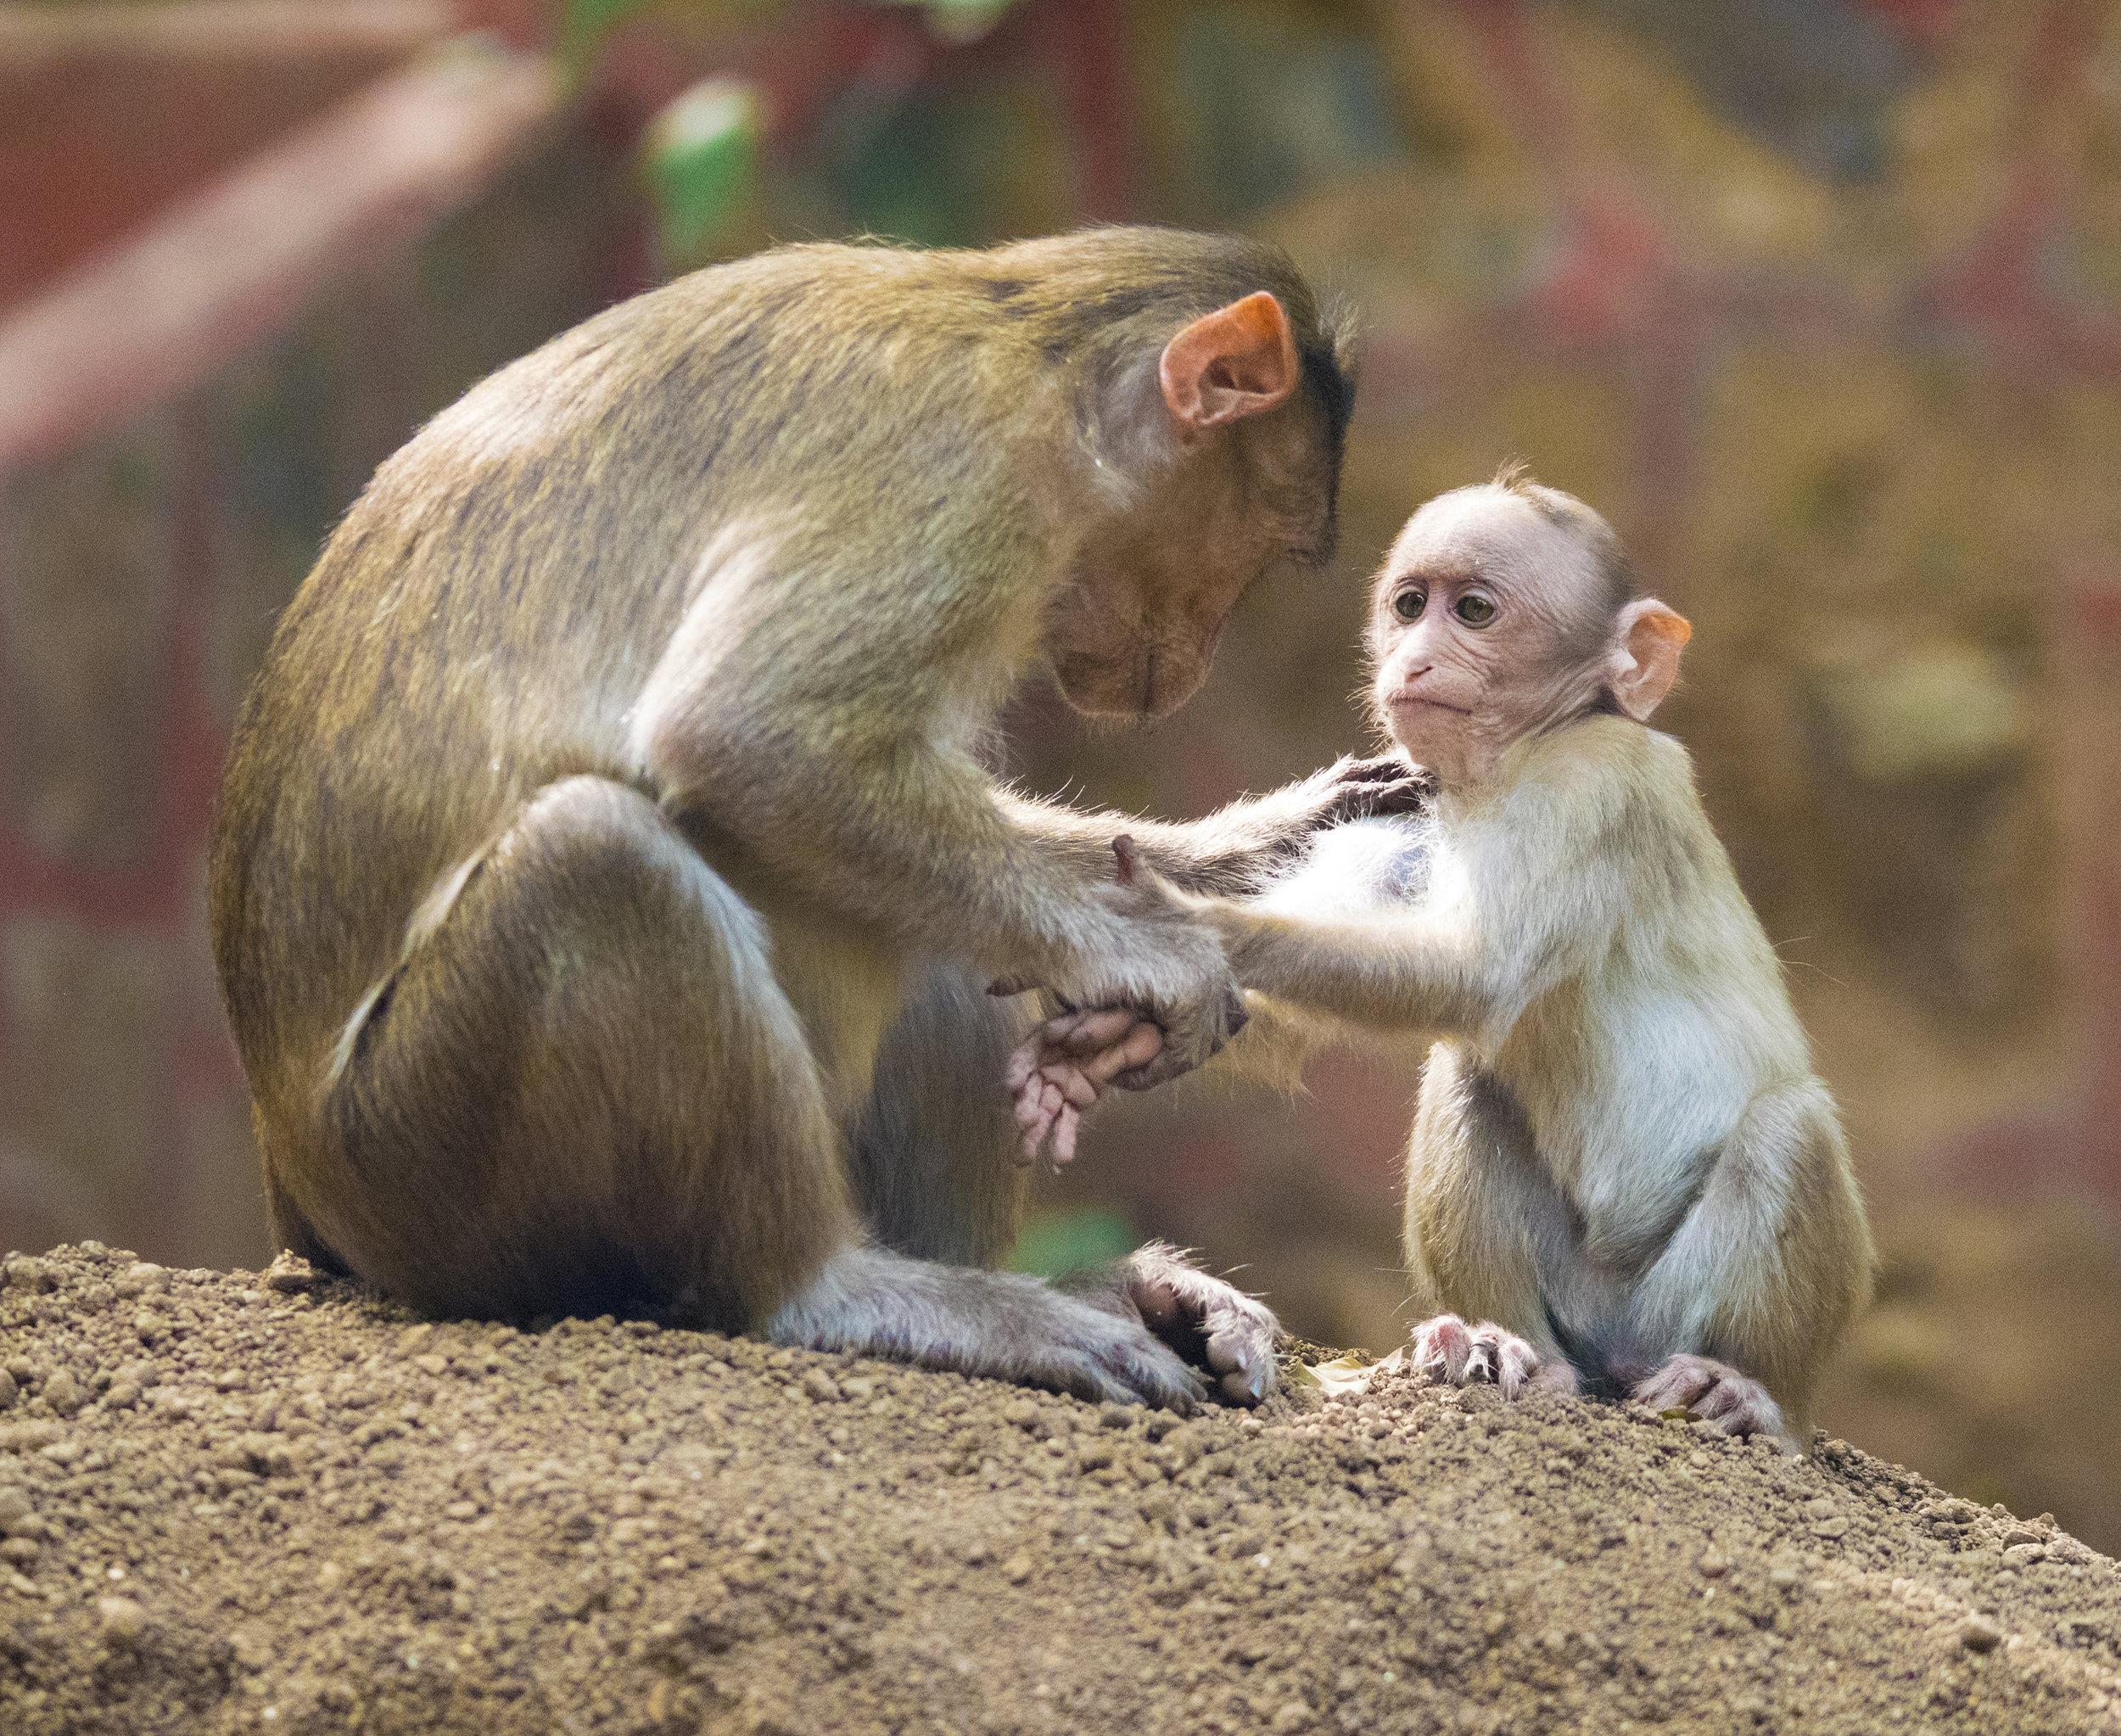 Monkeys at Karnala Bird Sanctuary, India